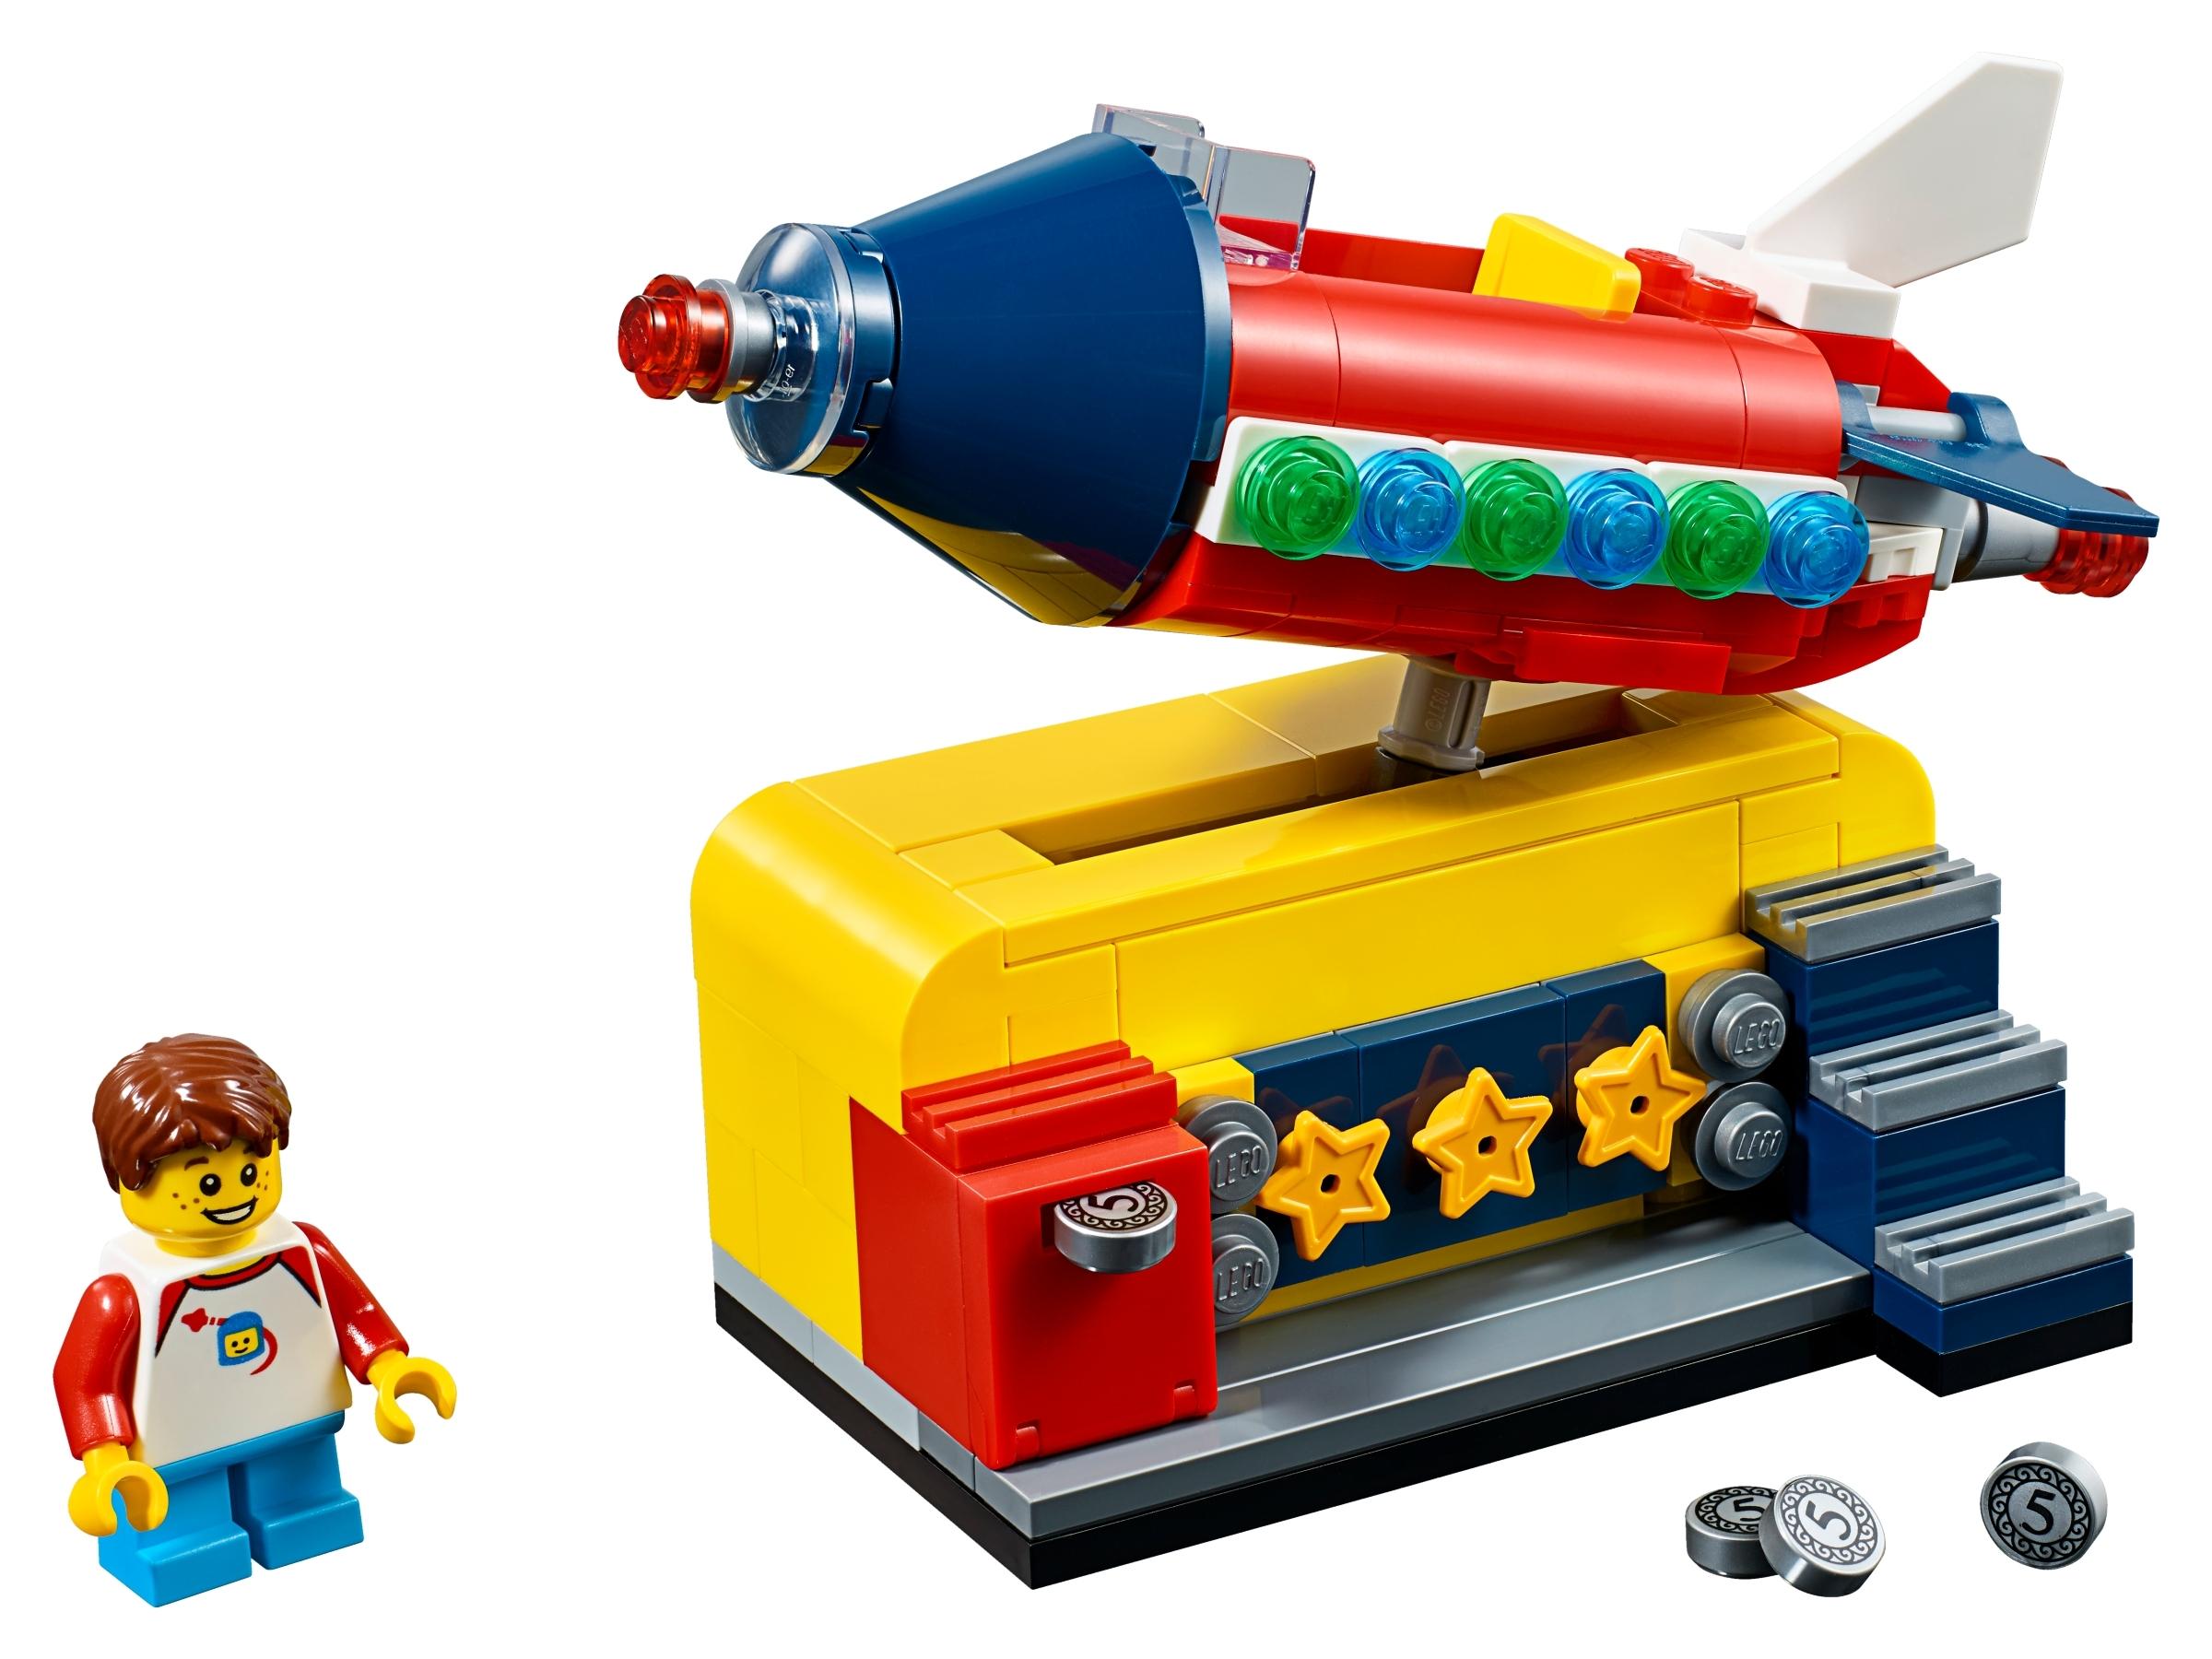 LEGO 40335 Lego Ideas Space Rocket Ride Exclusive Set BRAND NEW